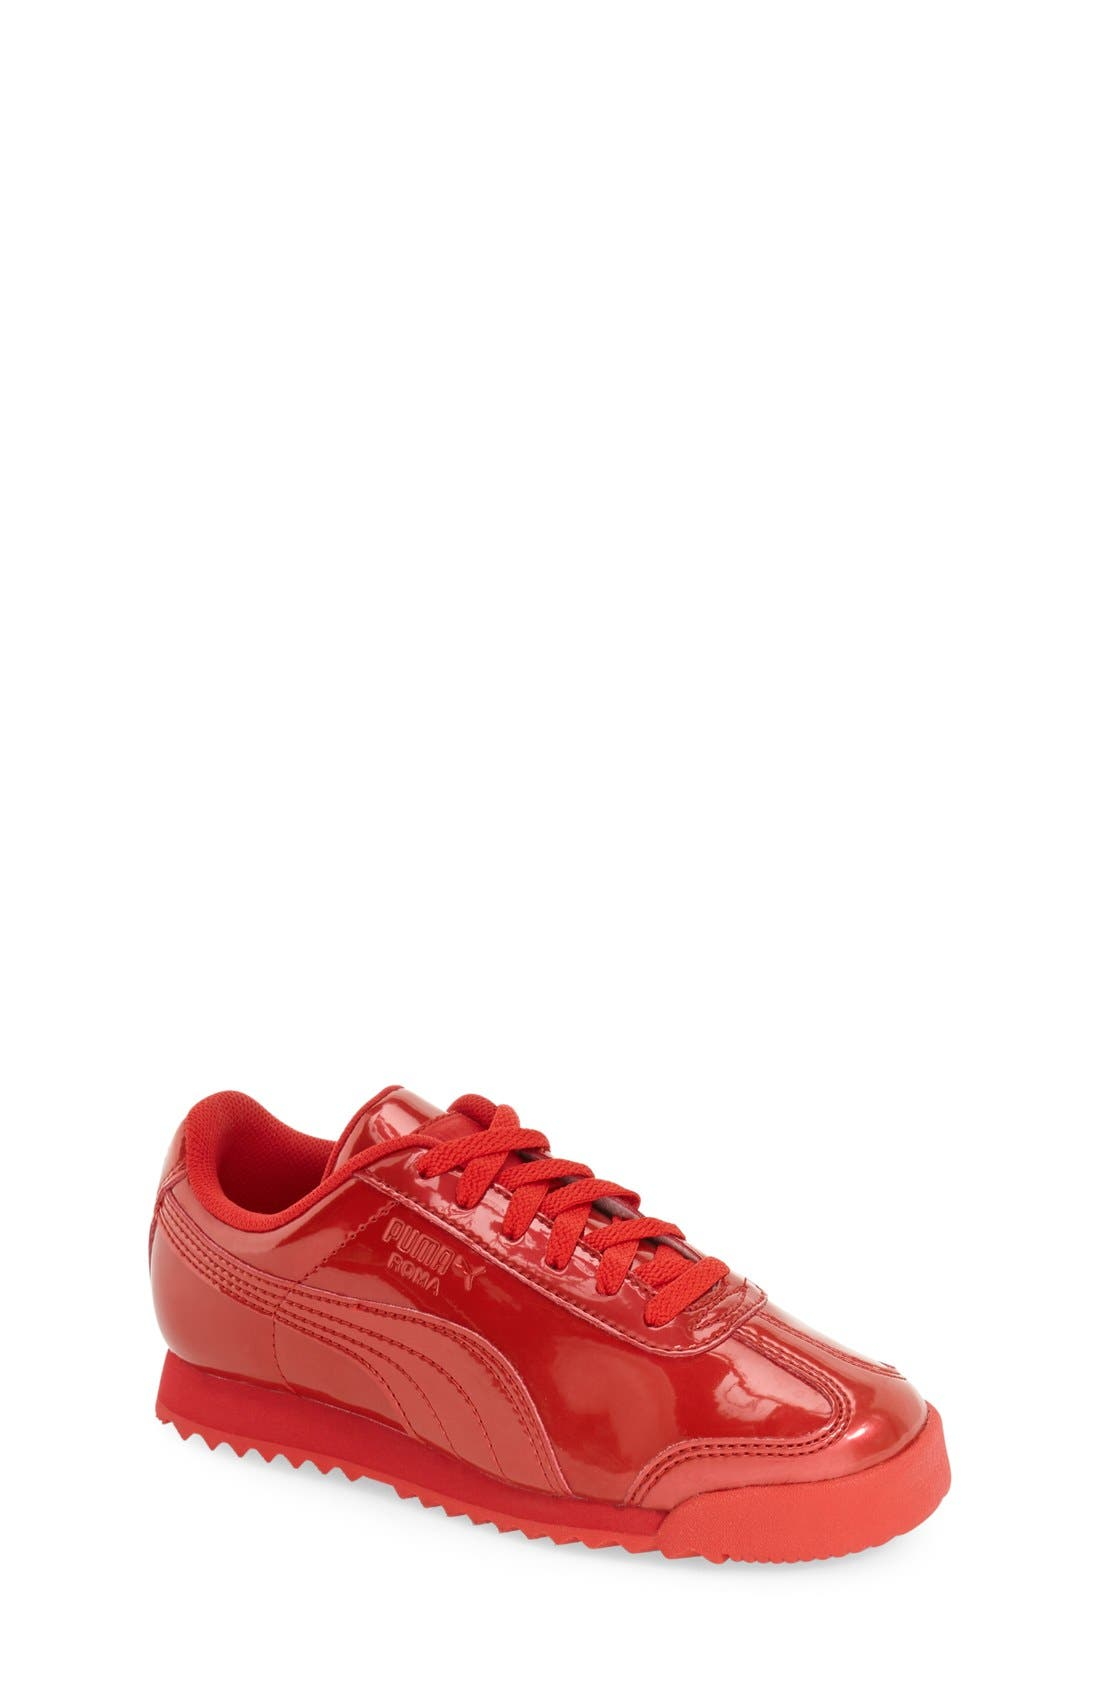 Main Image - PUMA 'Roma' Sneaker (Toddler, Little Kid & Big Kid)